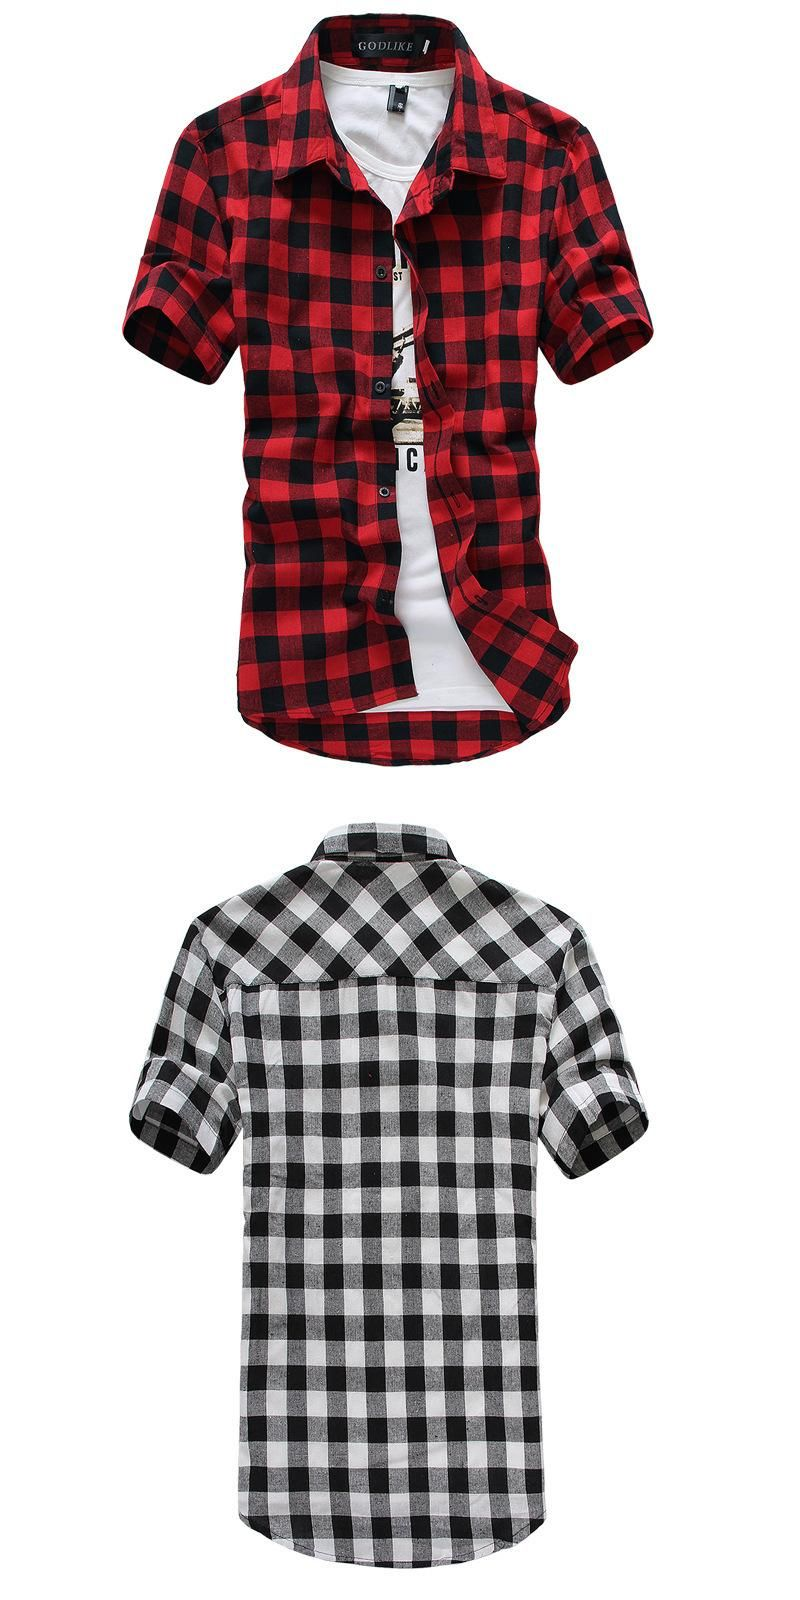 fd83889a54d Red And Black Plaid Shirt Men Shirts 2016 New Summer Fashion Chemise Homme  Mens Checkered Shirts